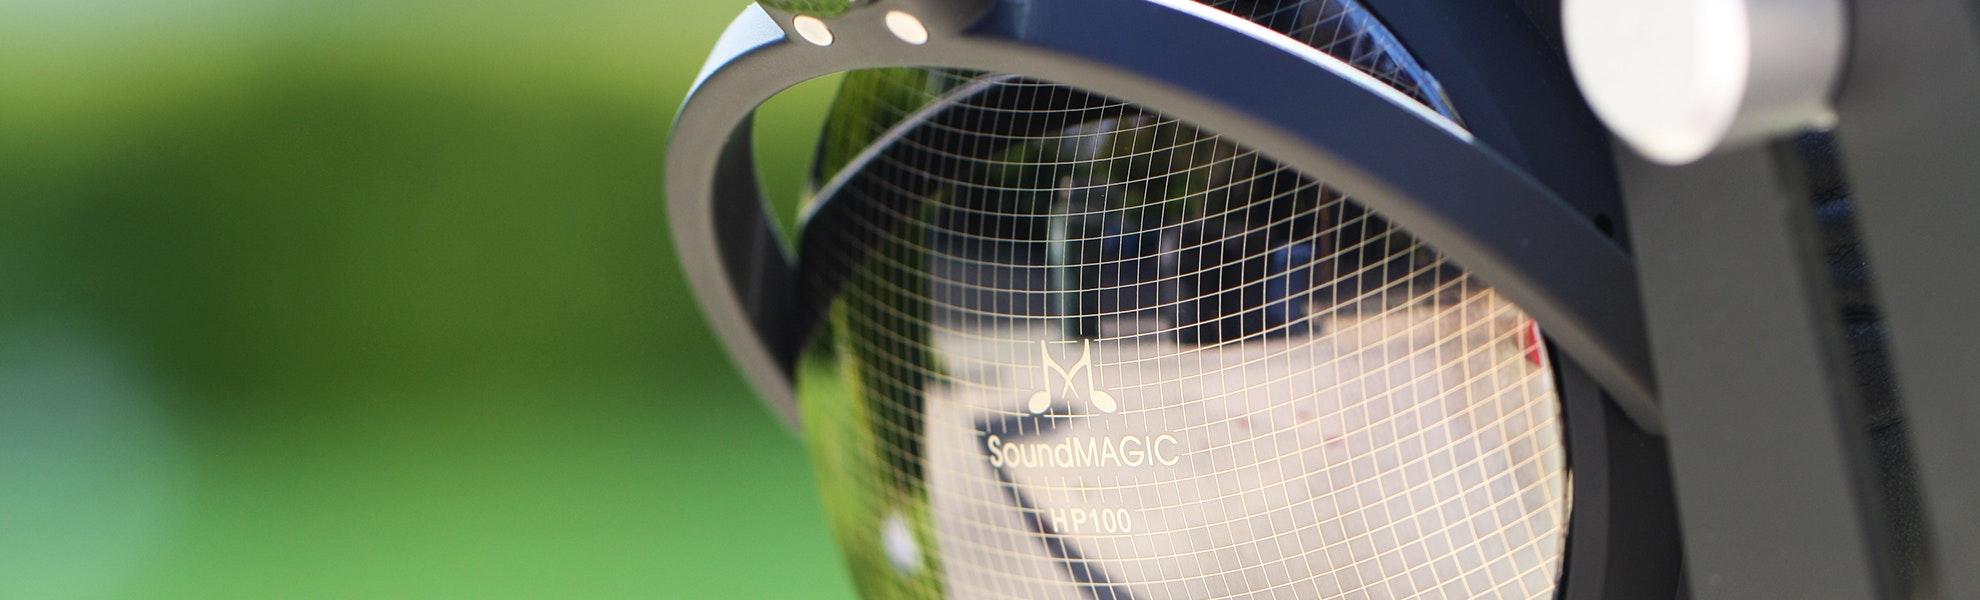 SoundMAGIC HP100 Headphones